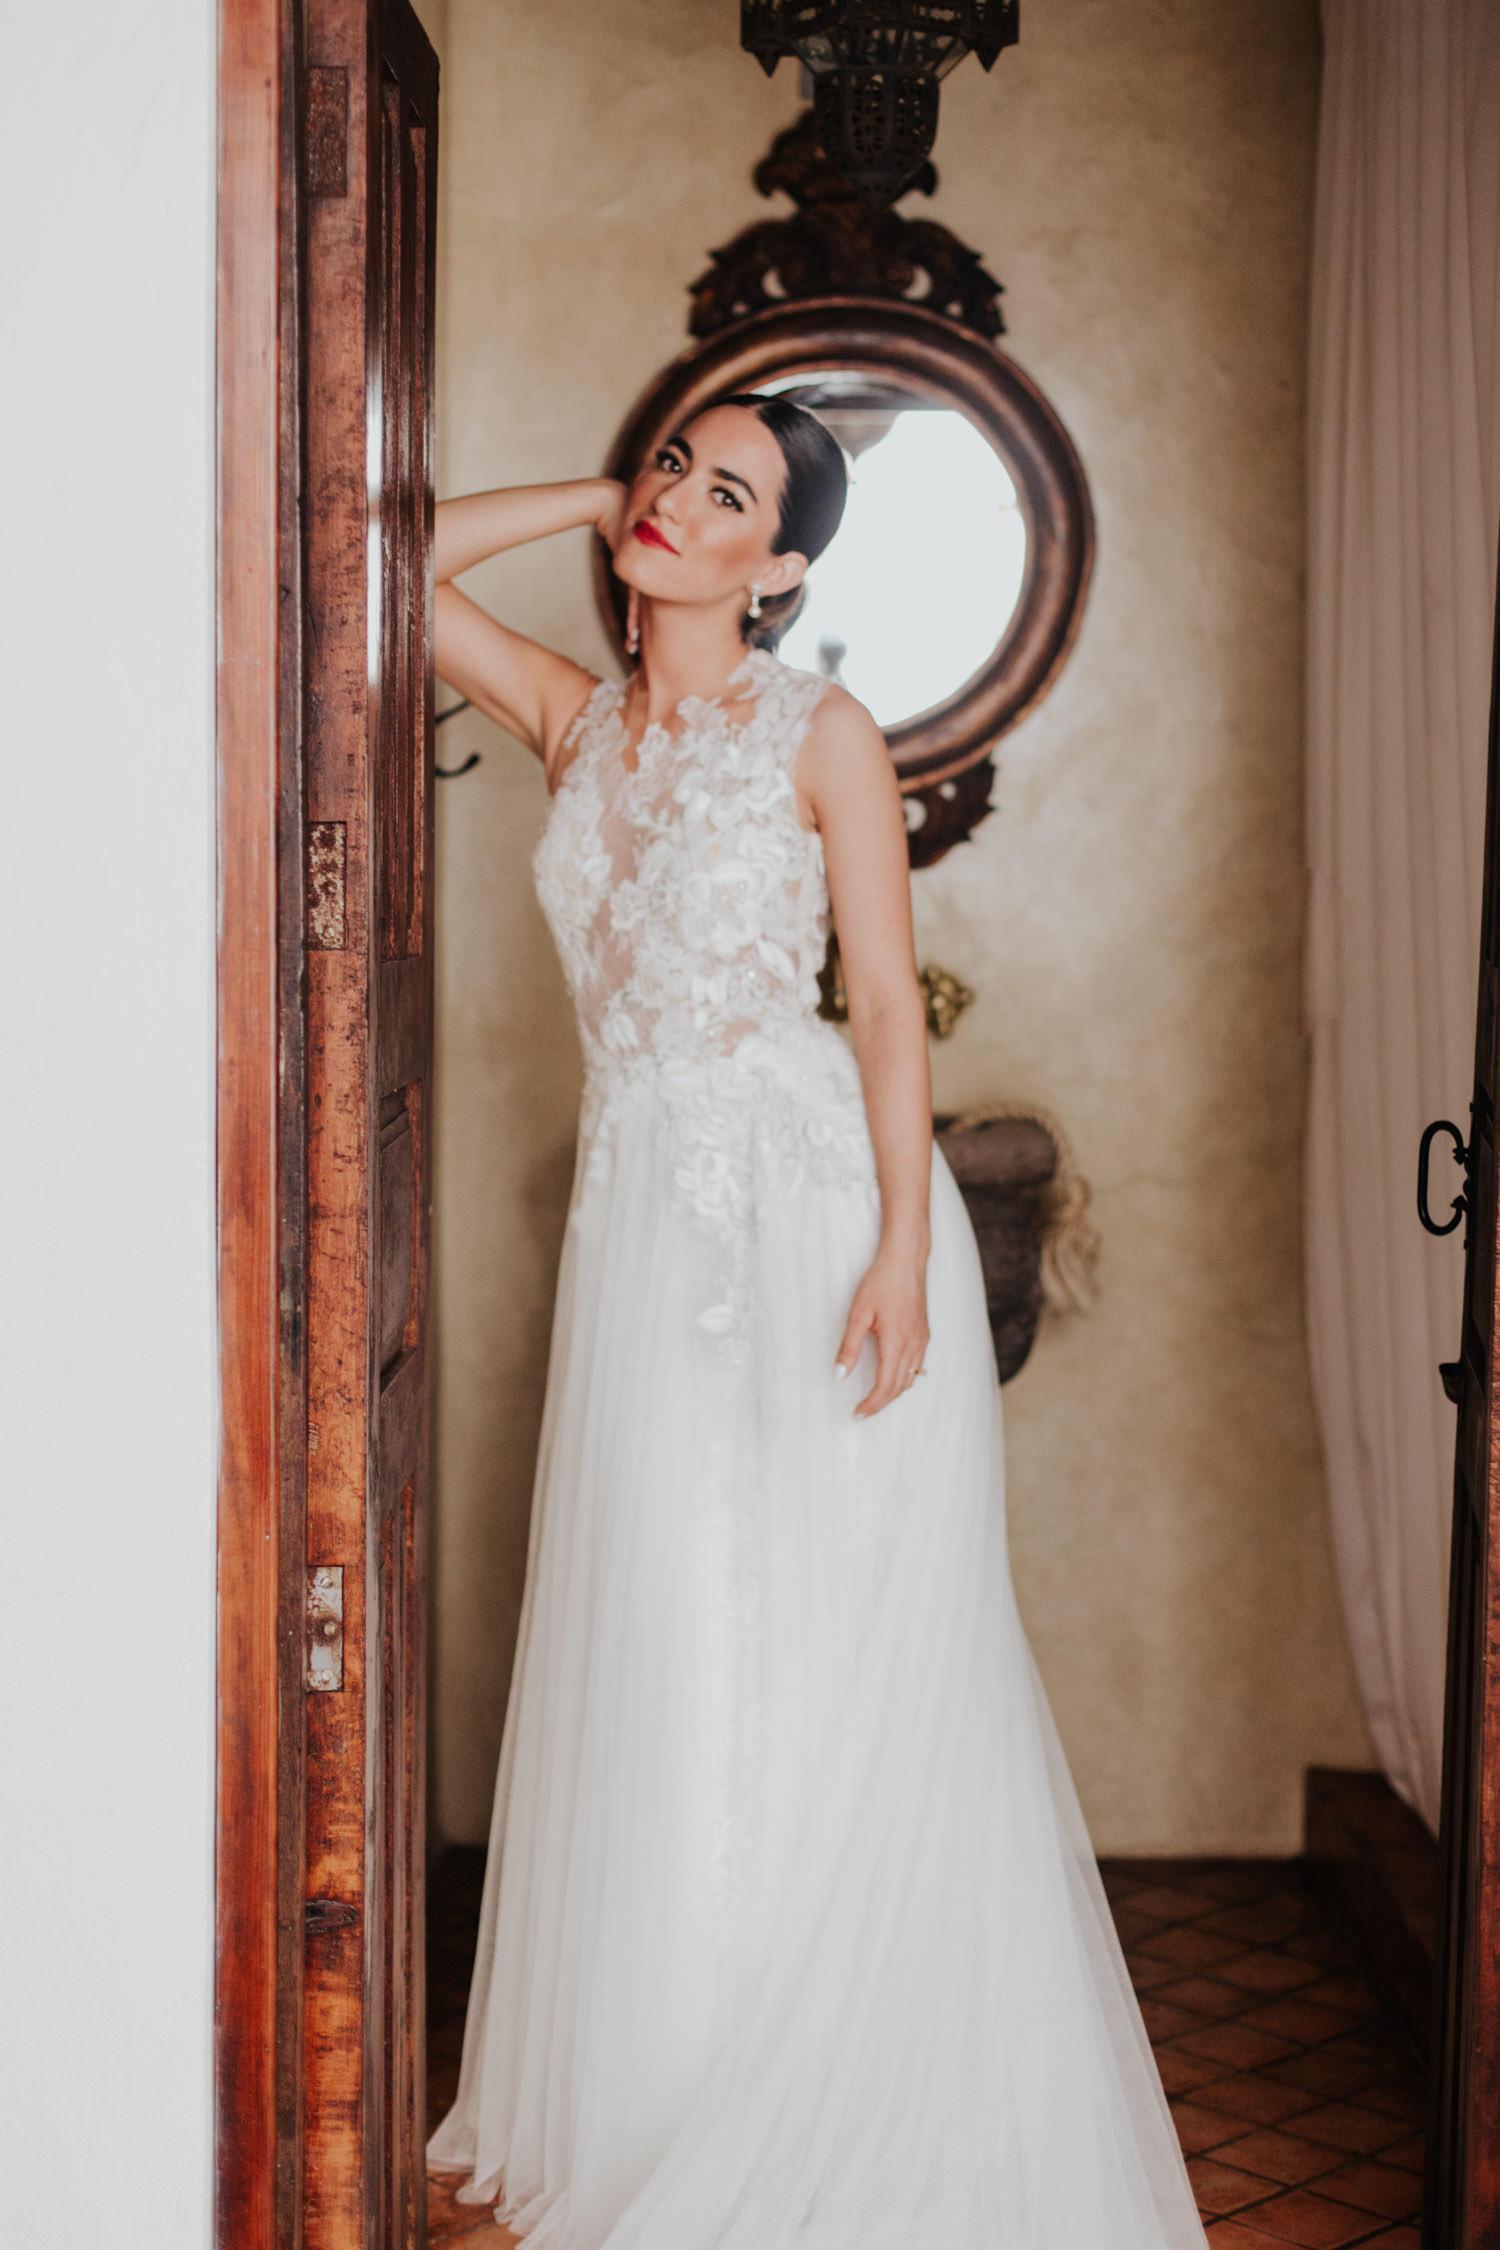 San-Miguel-de-Allende-Wedding-Photography-Parroquia-Instituto-Boda-Fotografia-Fer-Sergio-Pierce-Lifestyle-Photography0108.JPG